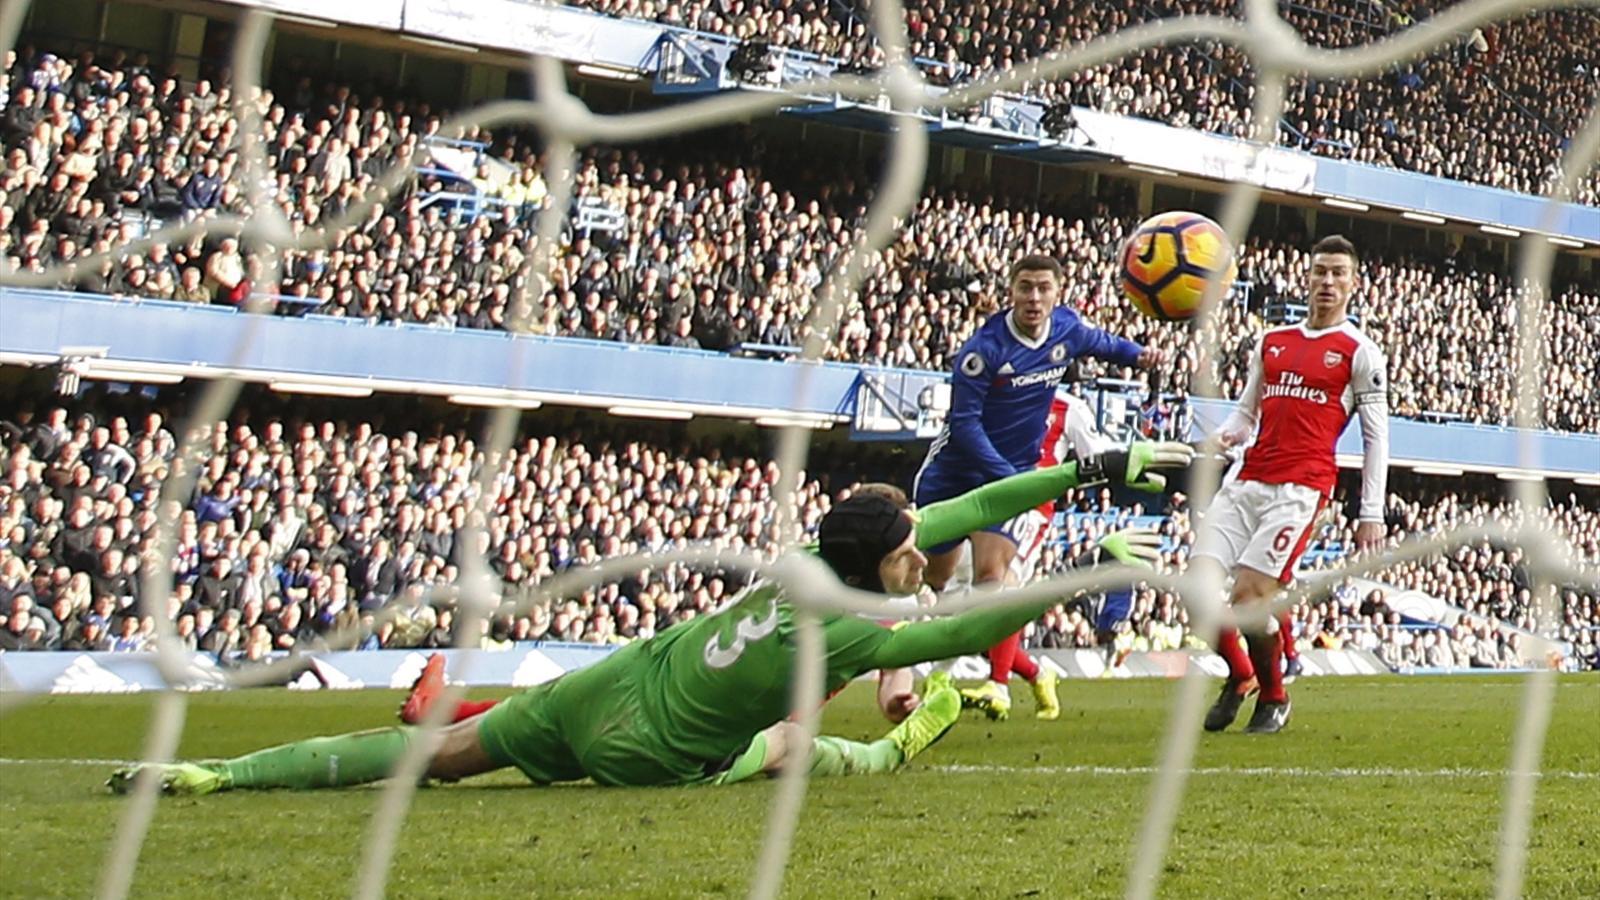 Eden Hazard scores incredible solo goal as Chelsea end Arsenal title bid - Premier League 2016 ...